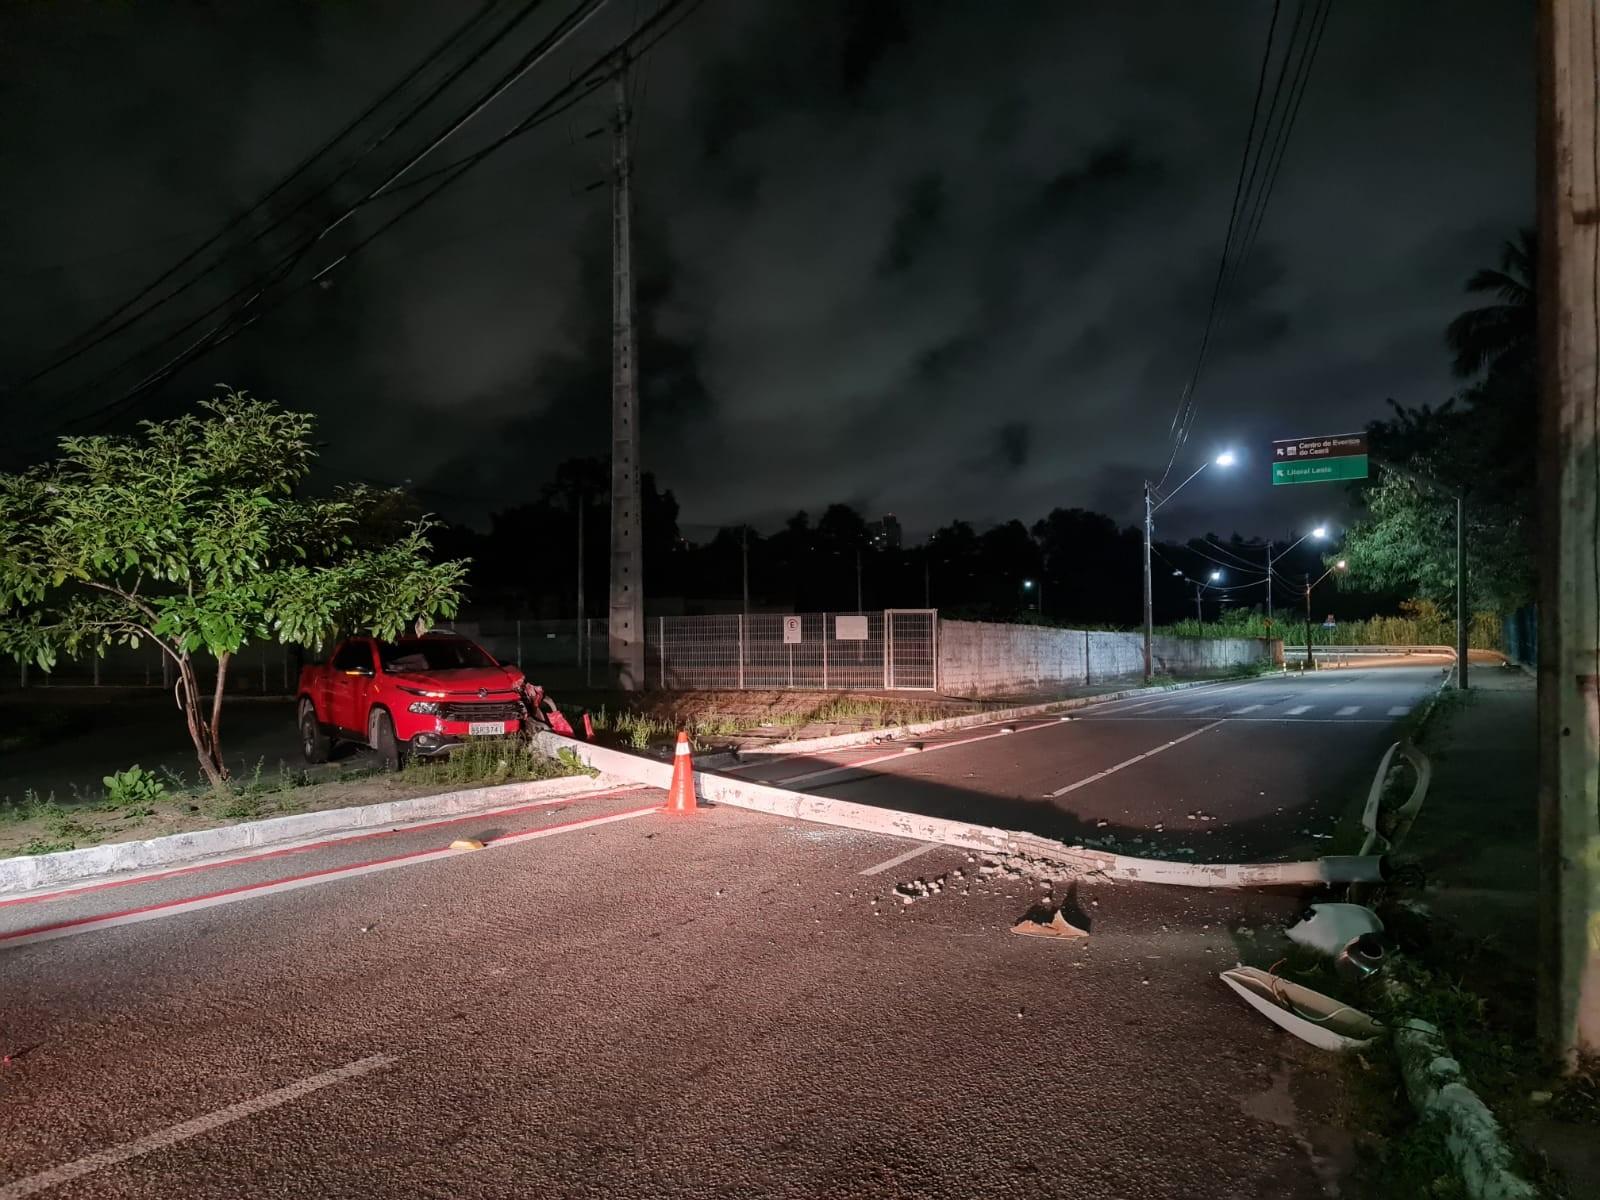 Professora fica ferida após bater carro e derrubar poste em rua de Fortaleza